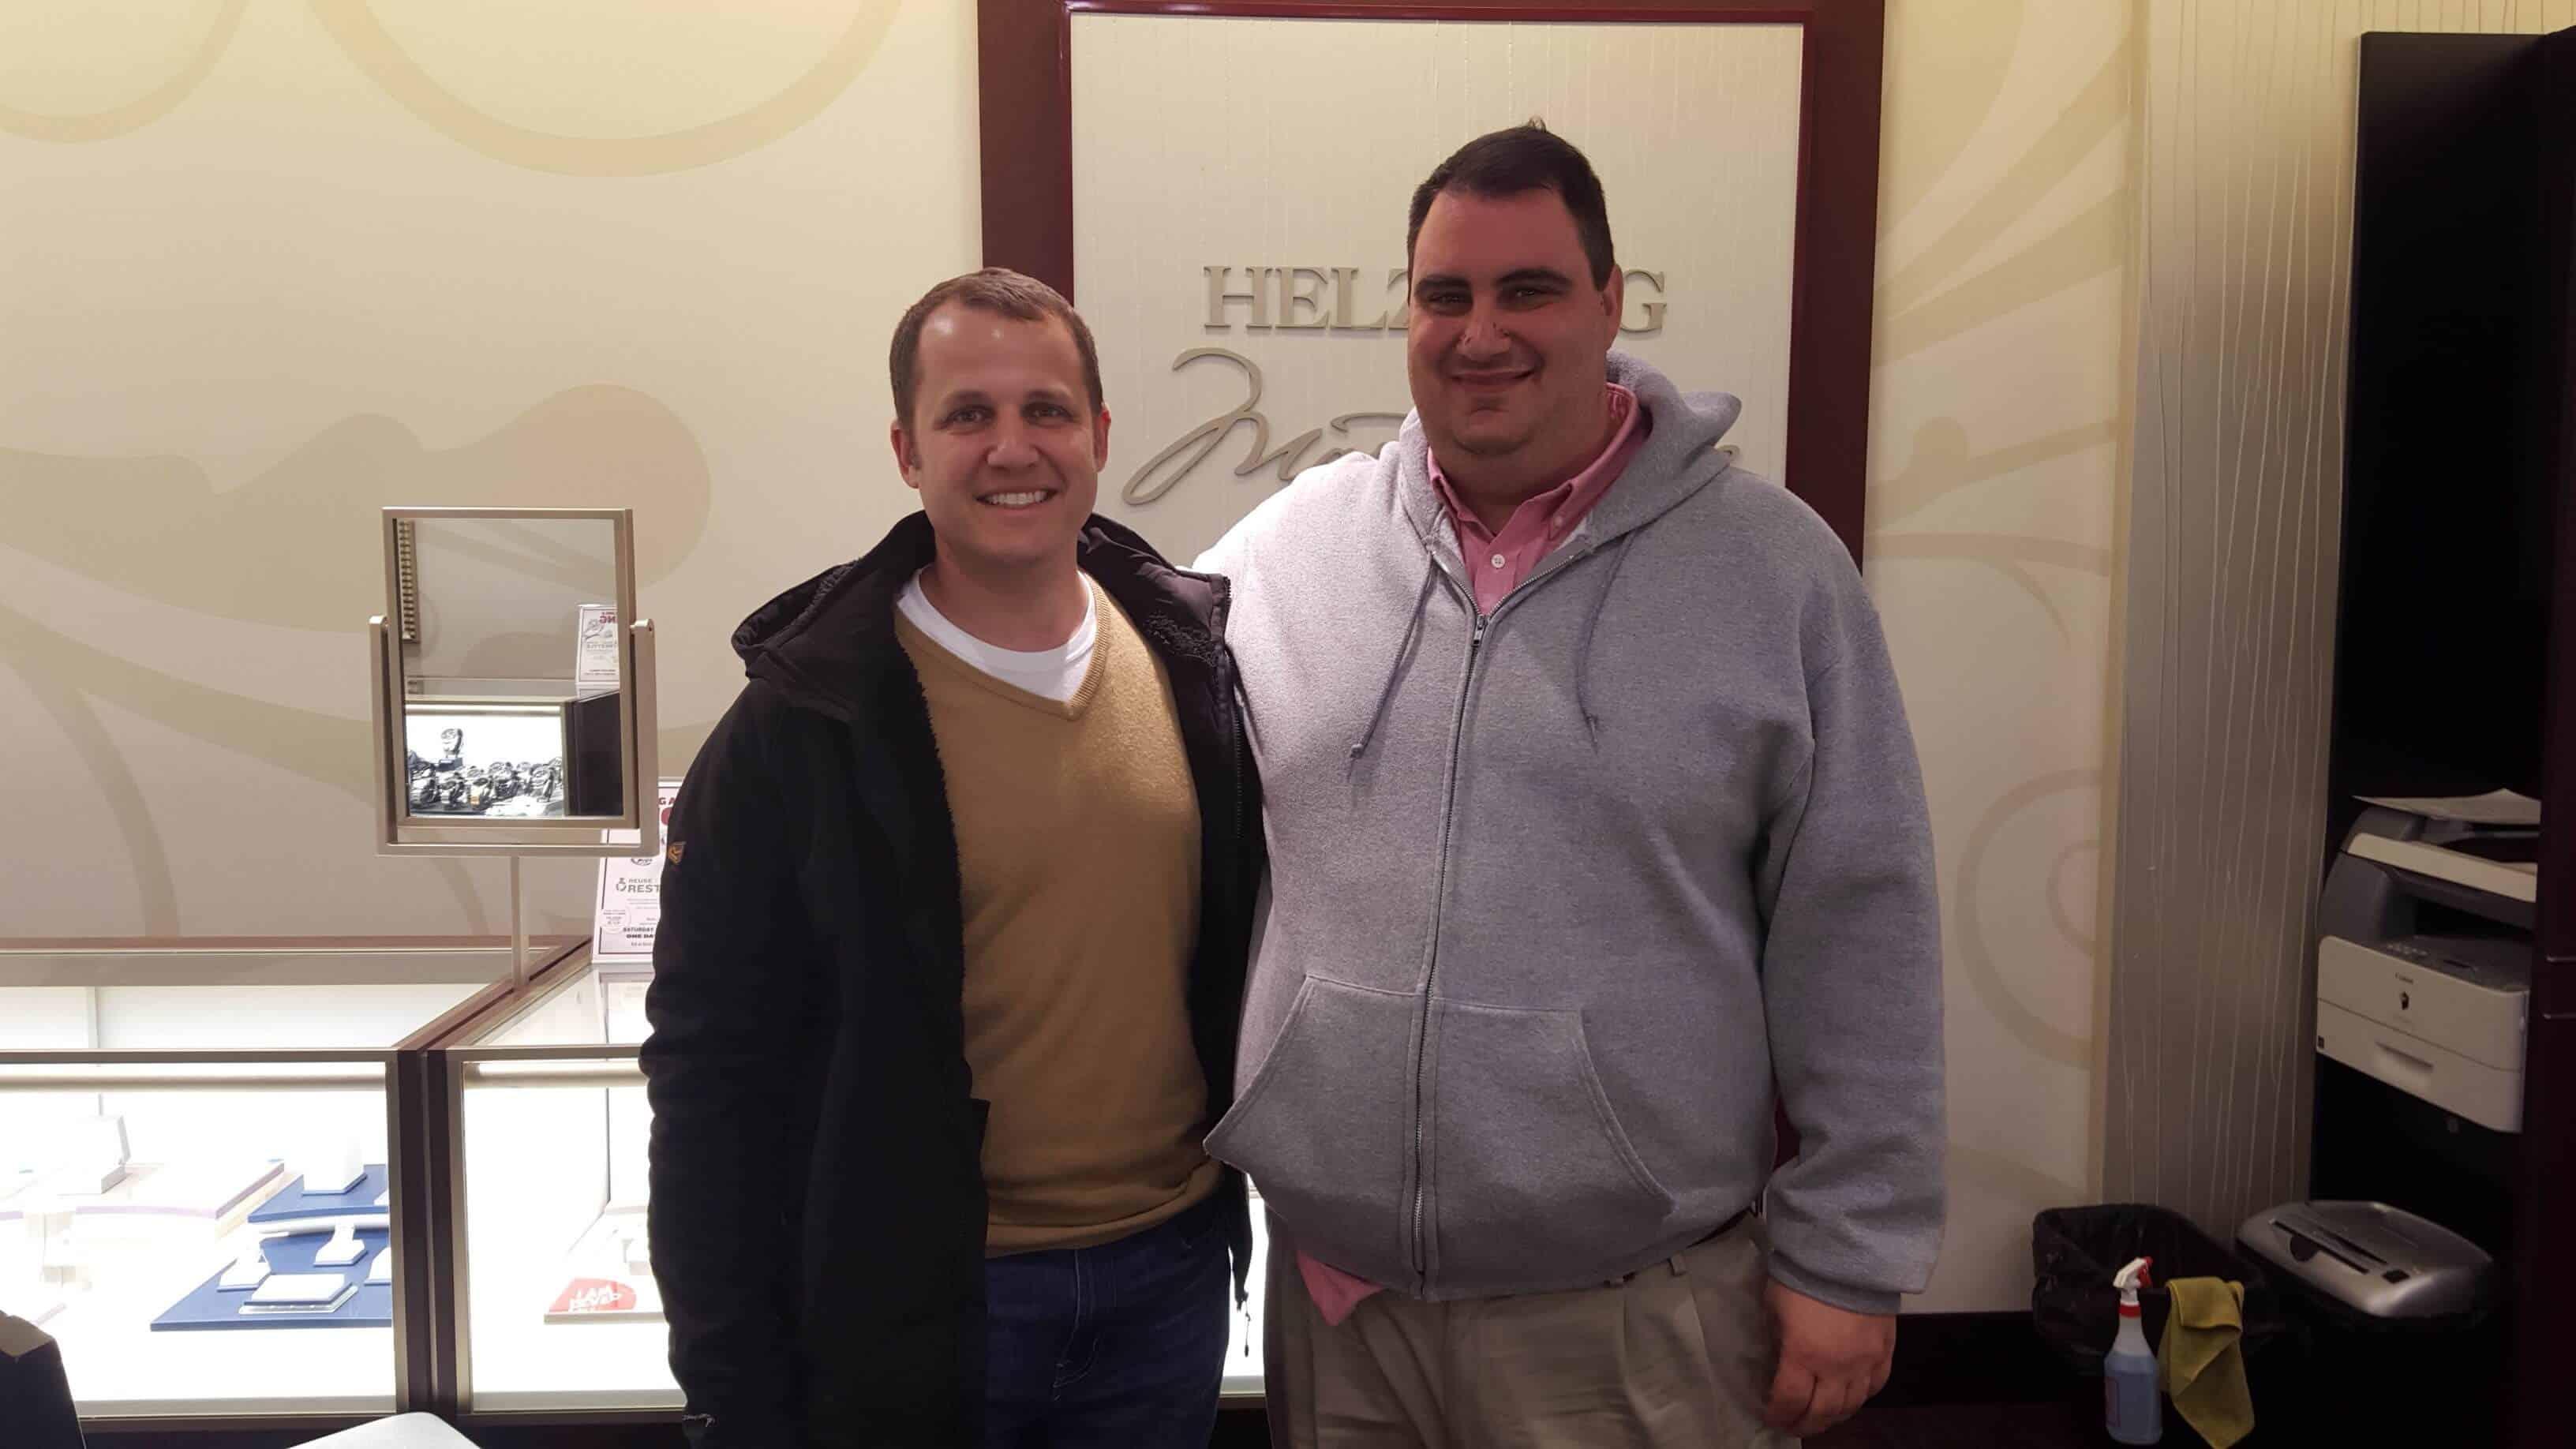 Ira & Mike Shopping at Helzberg